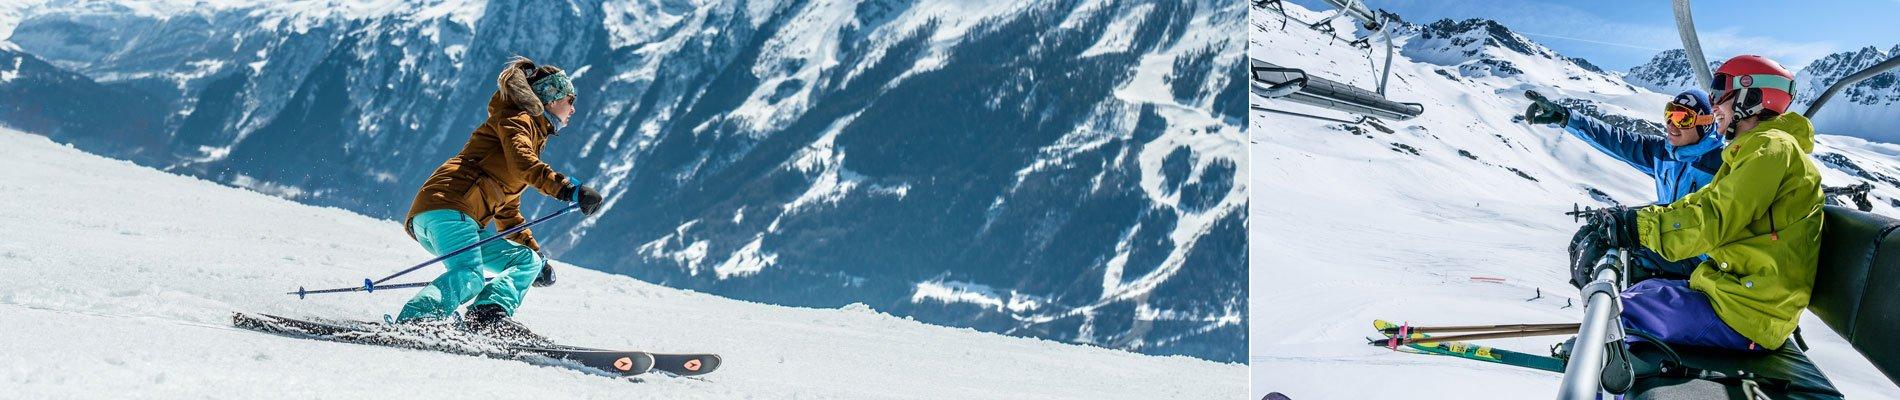 wintersport algemeen banner 1900x400